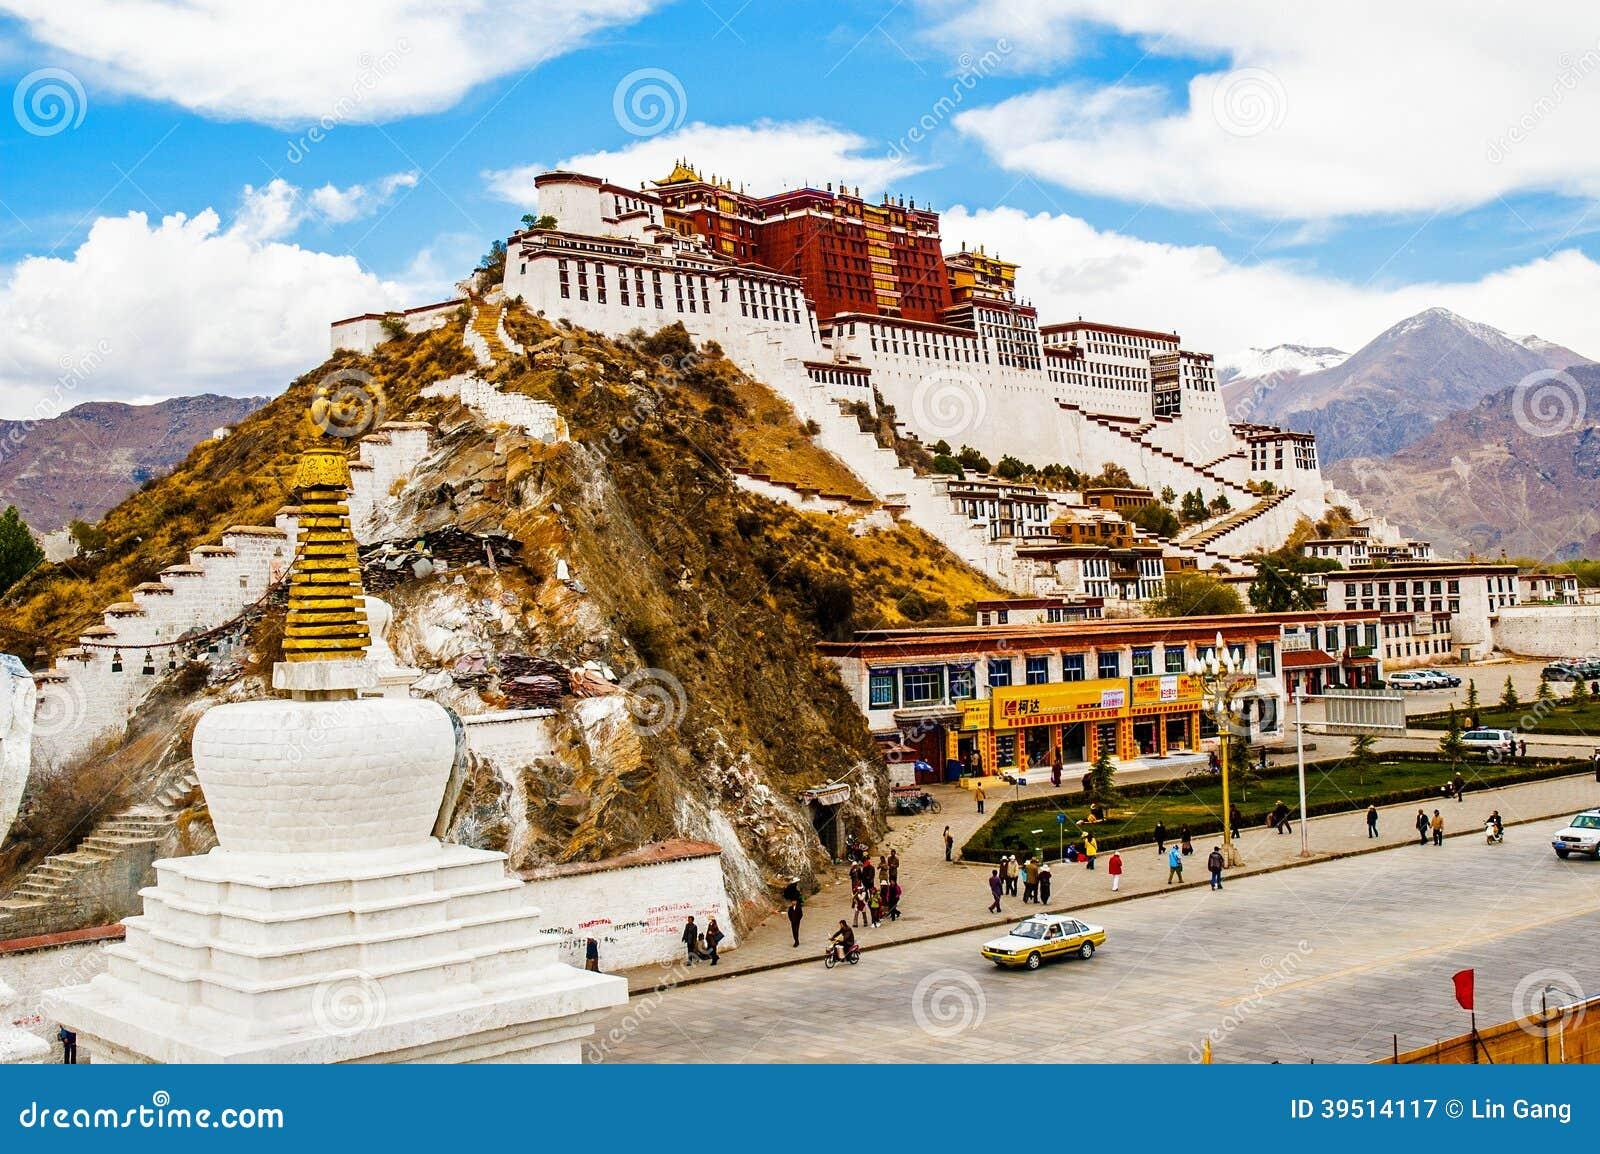 Tibetan plateau scene-Potala Palace and prayer Pagodas